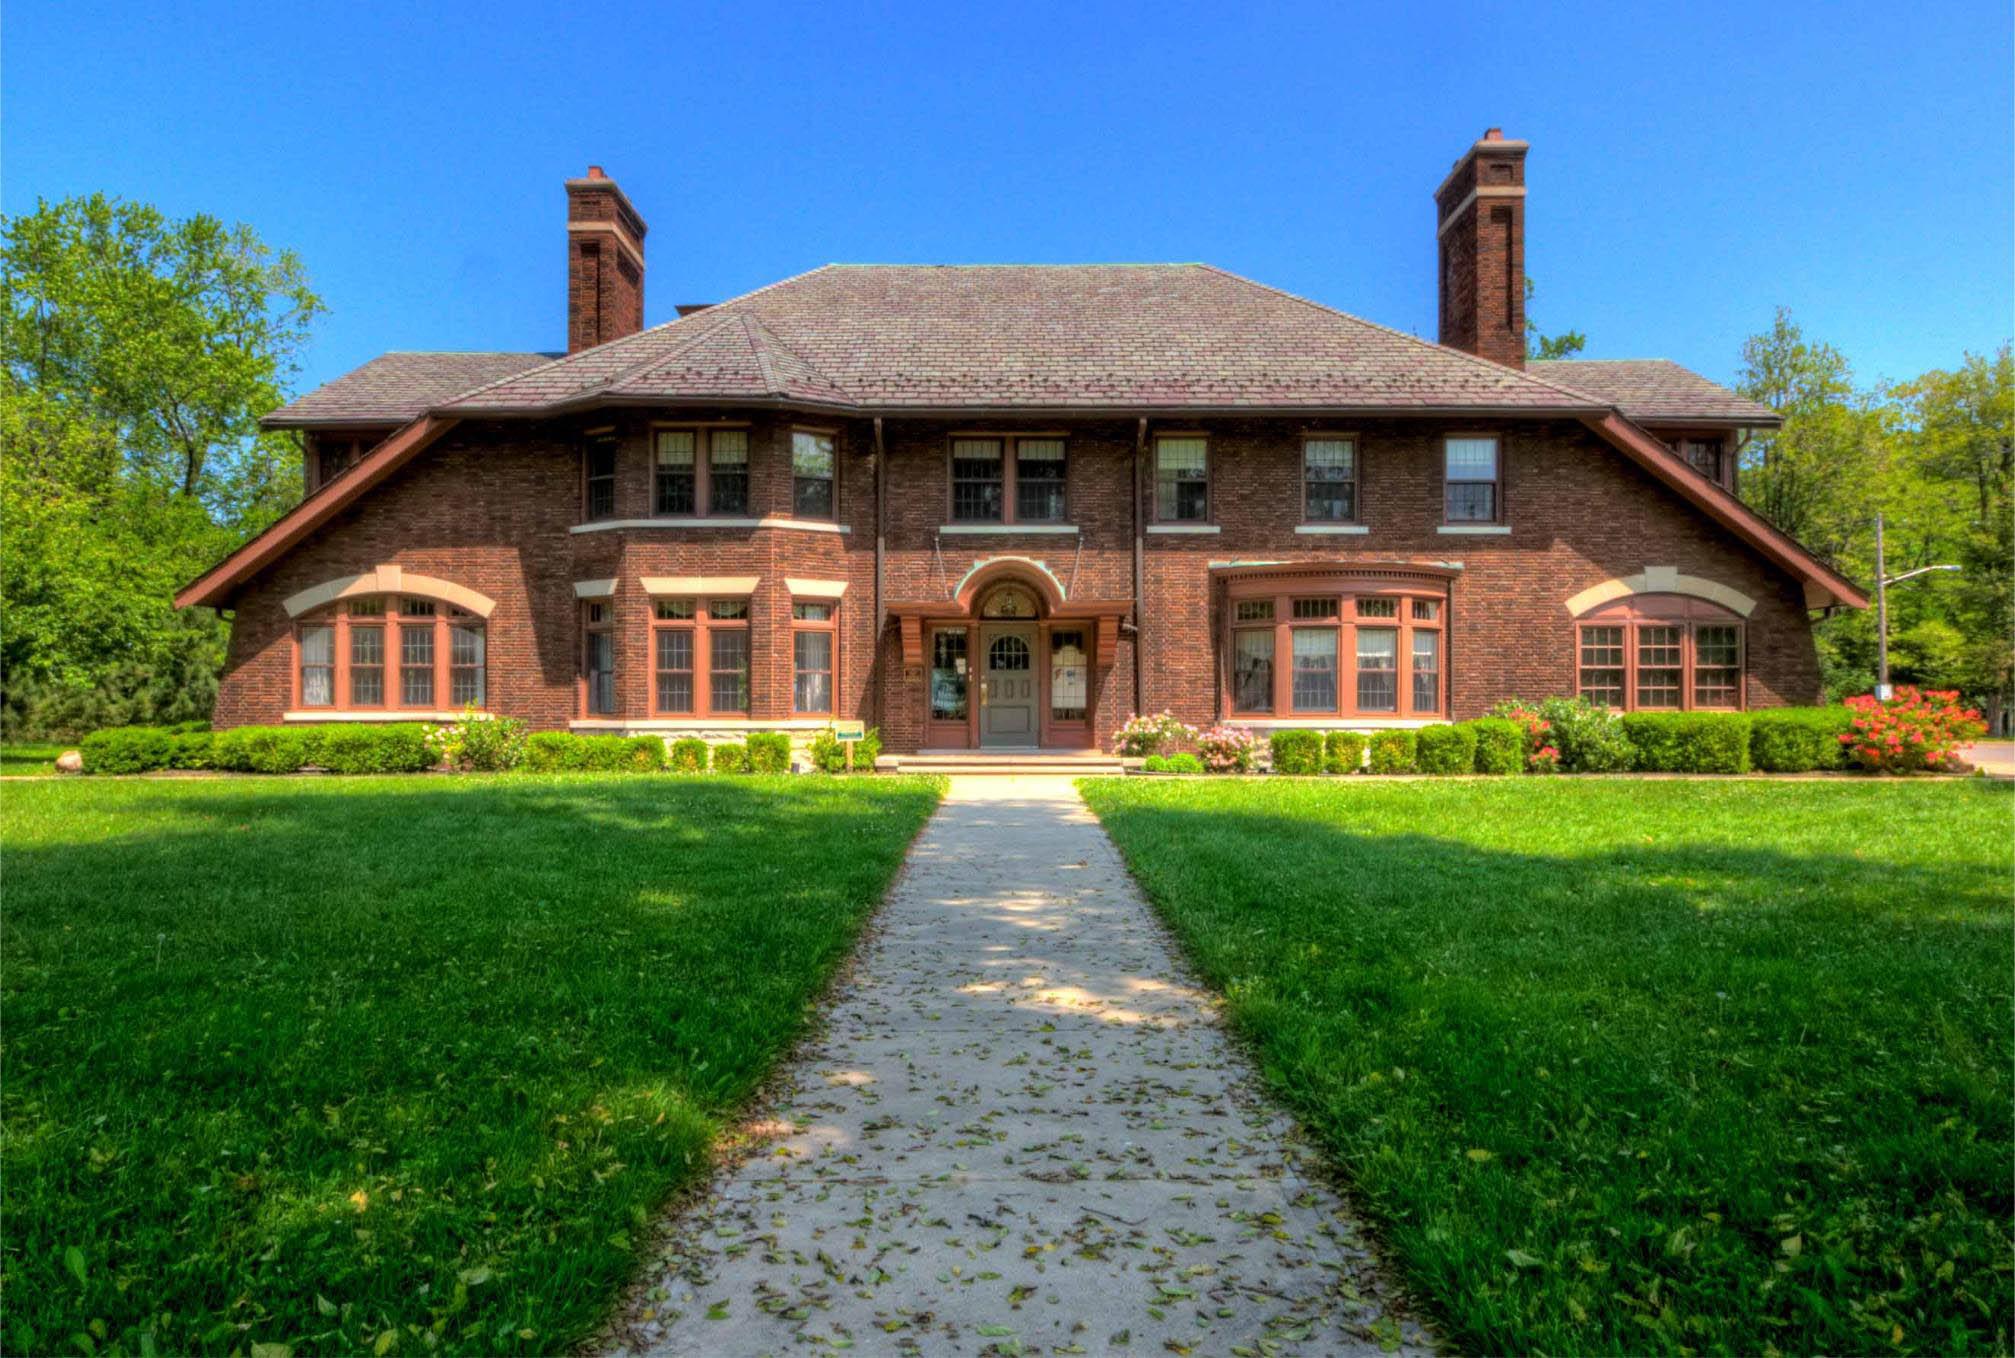 Henn Mansion